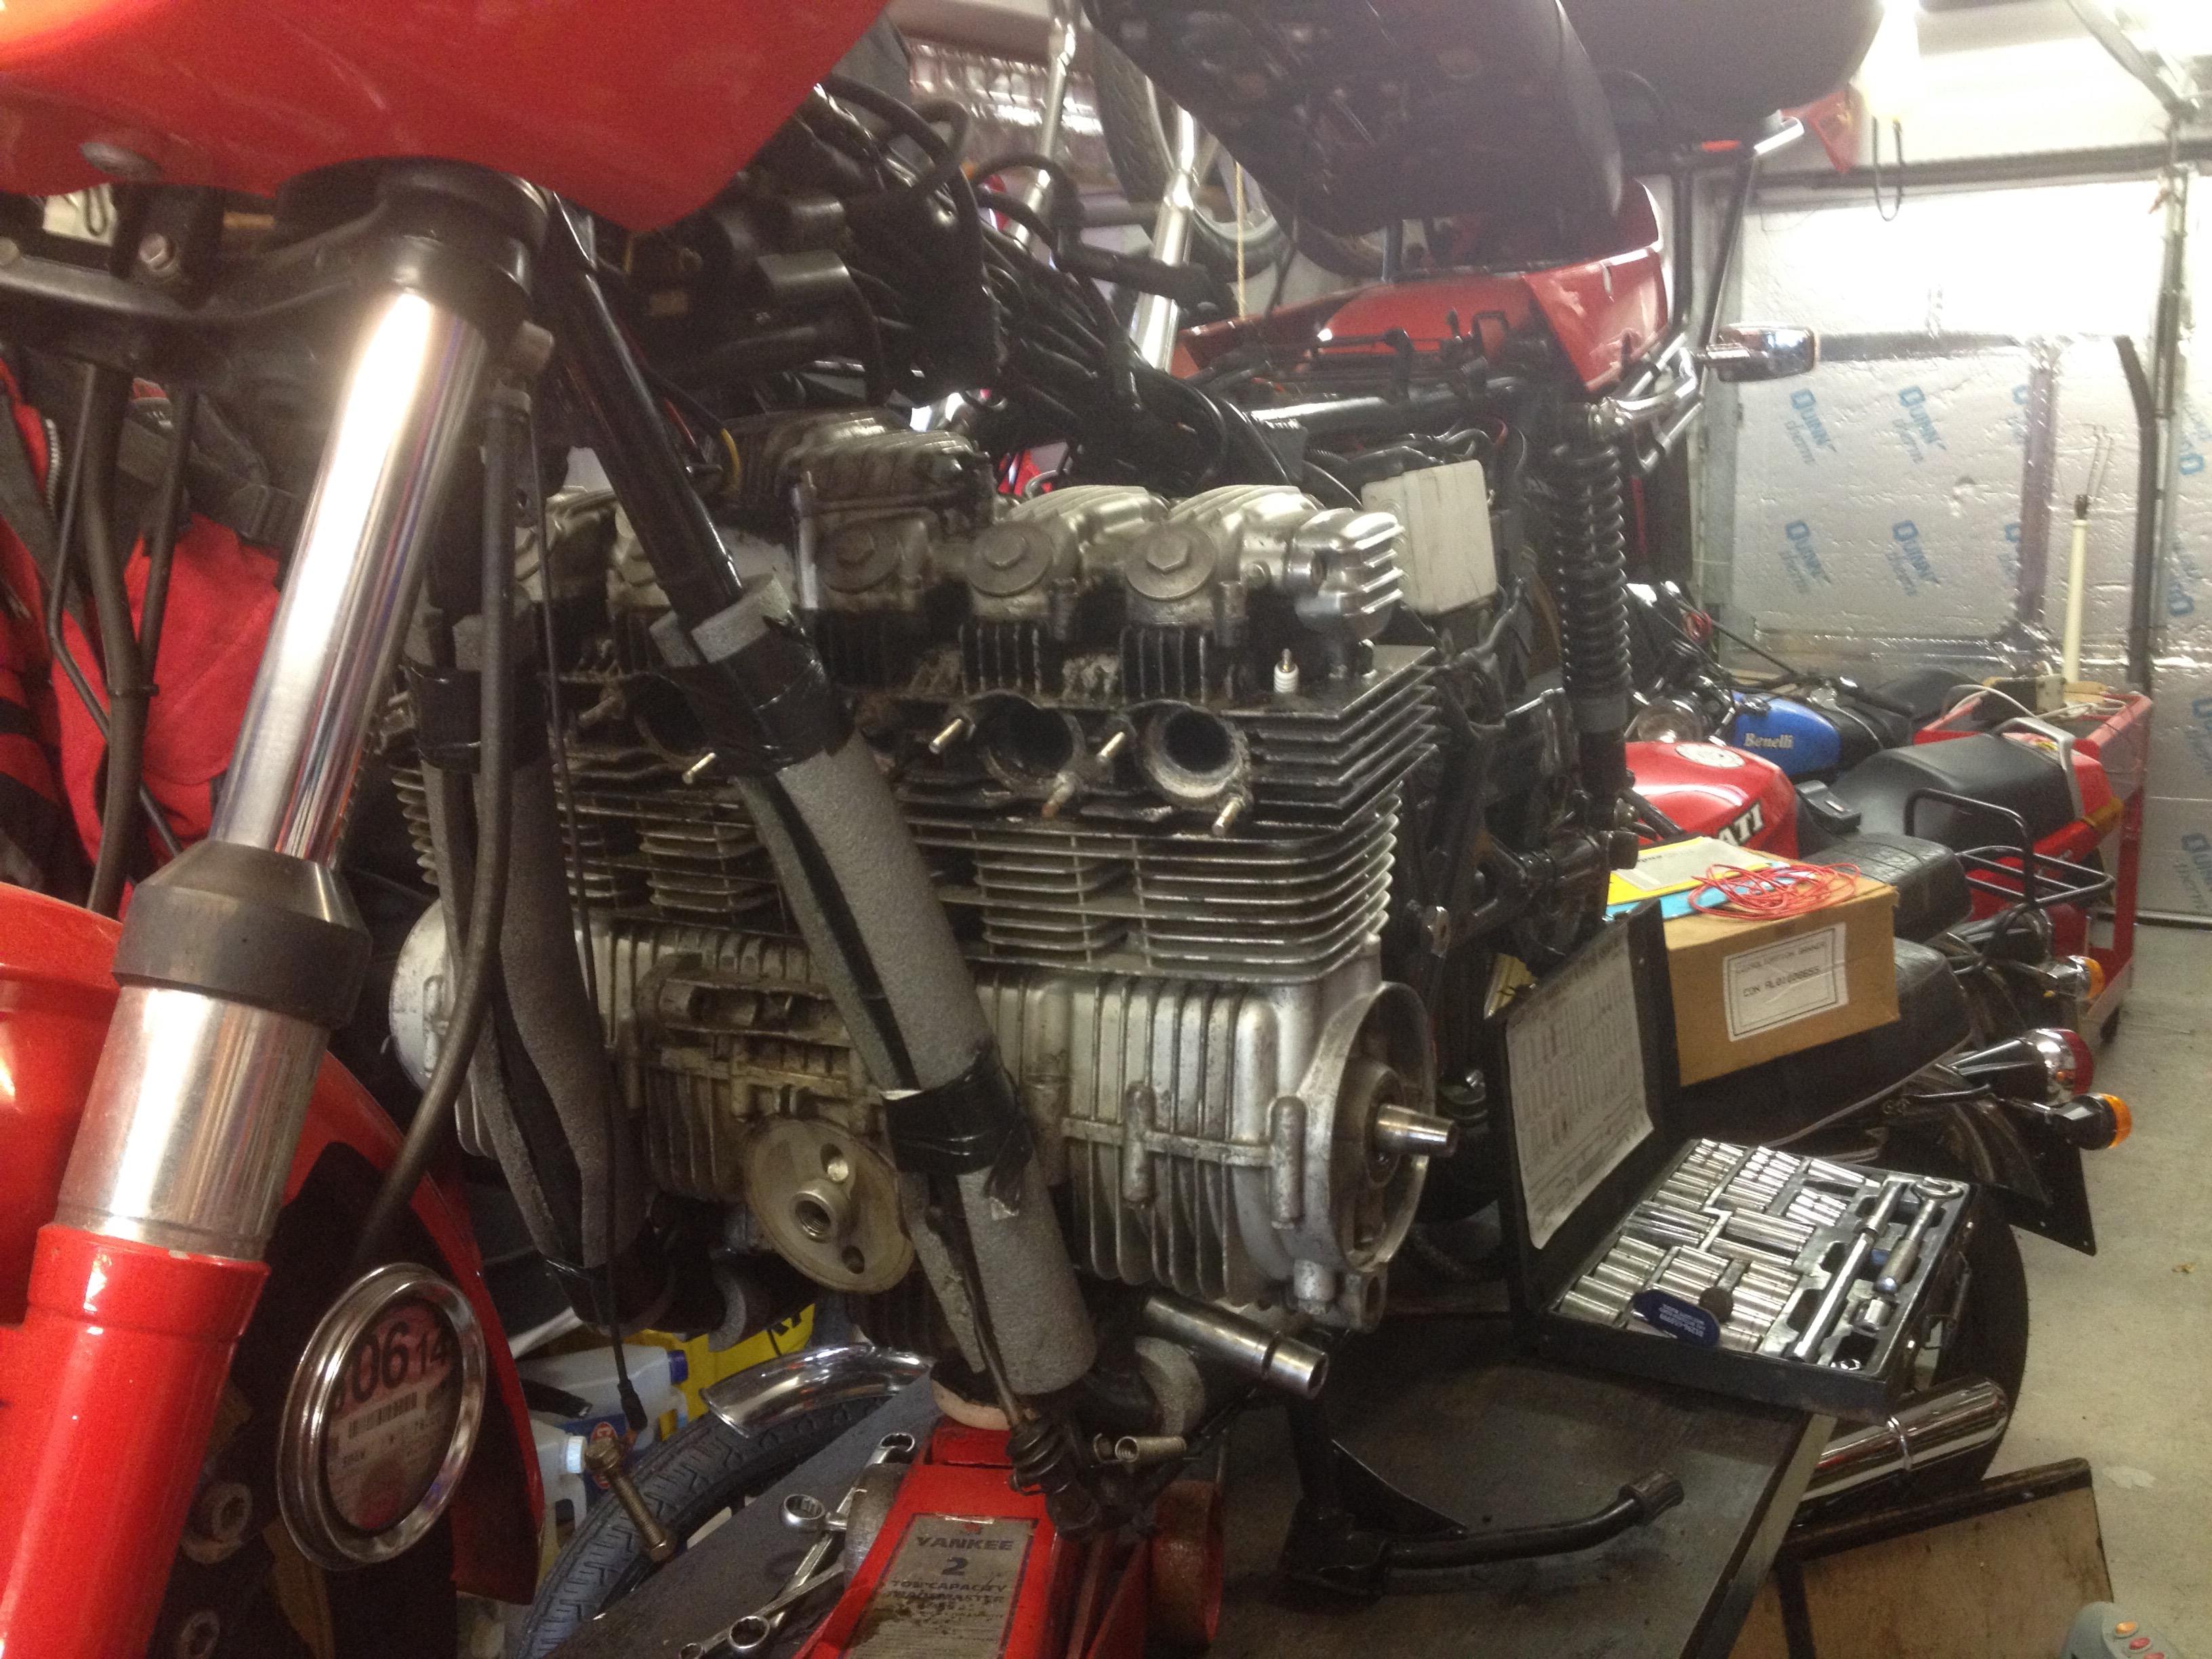 Benelli 900 SEI engine rebuild-image.jpeg